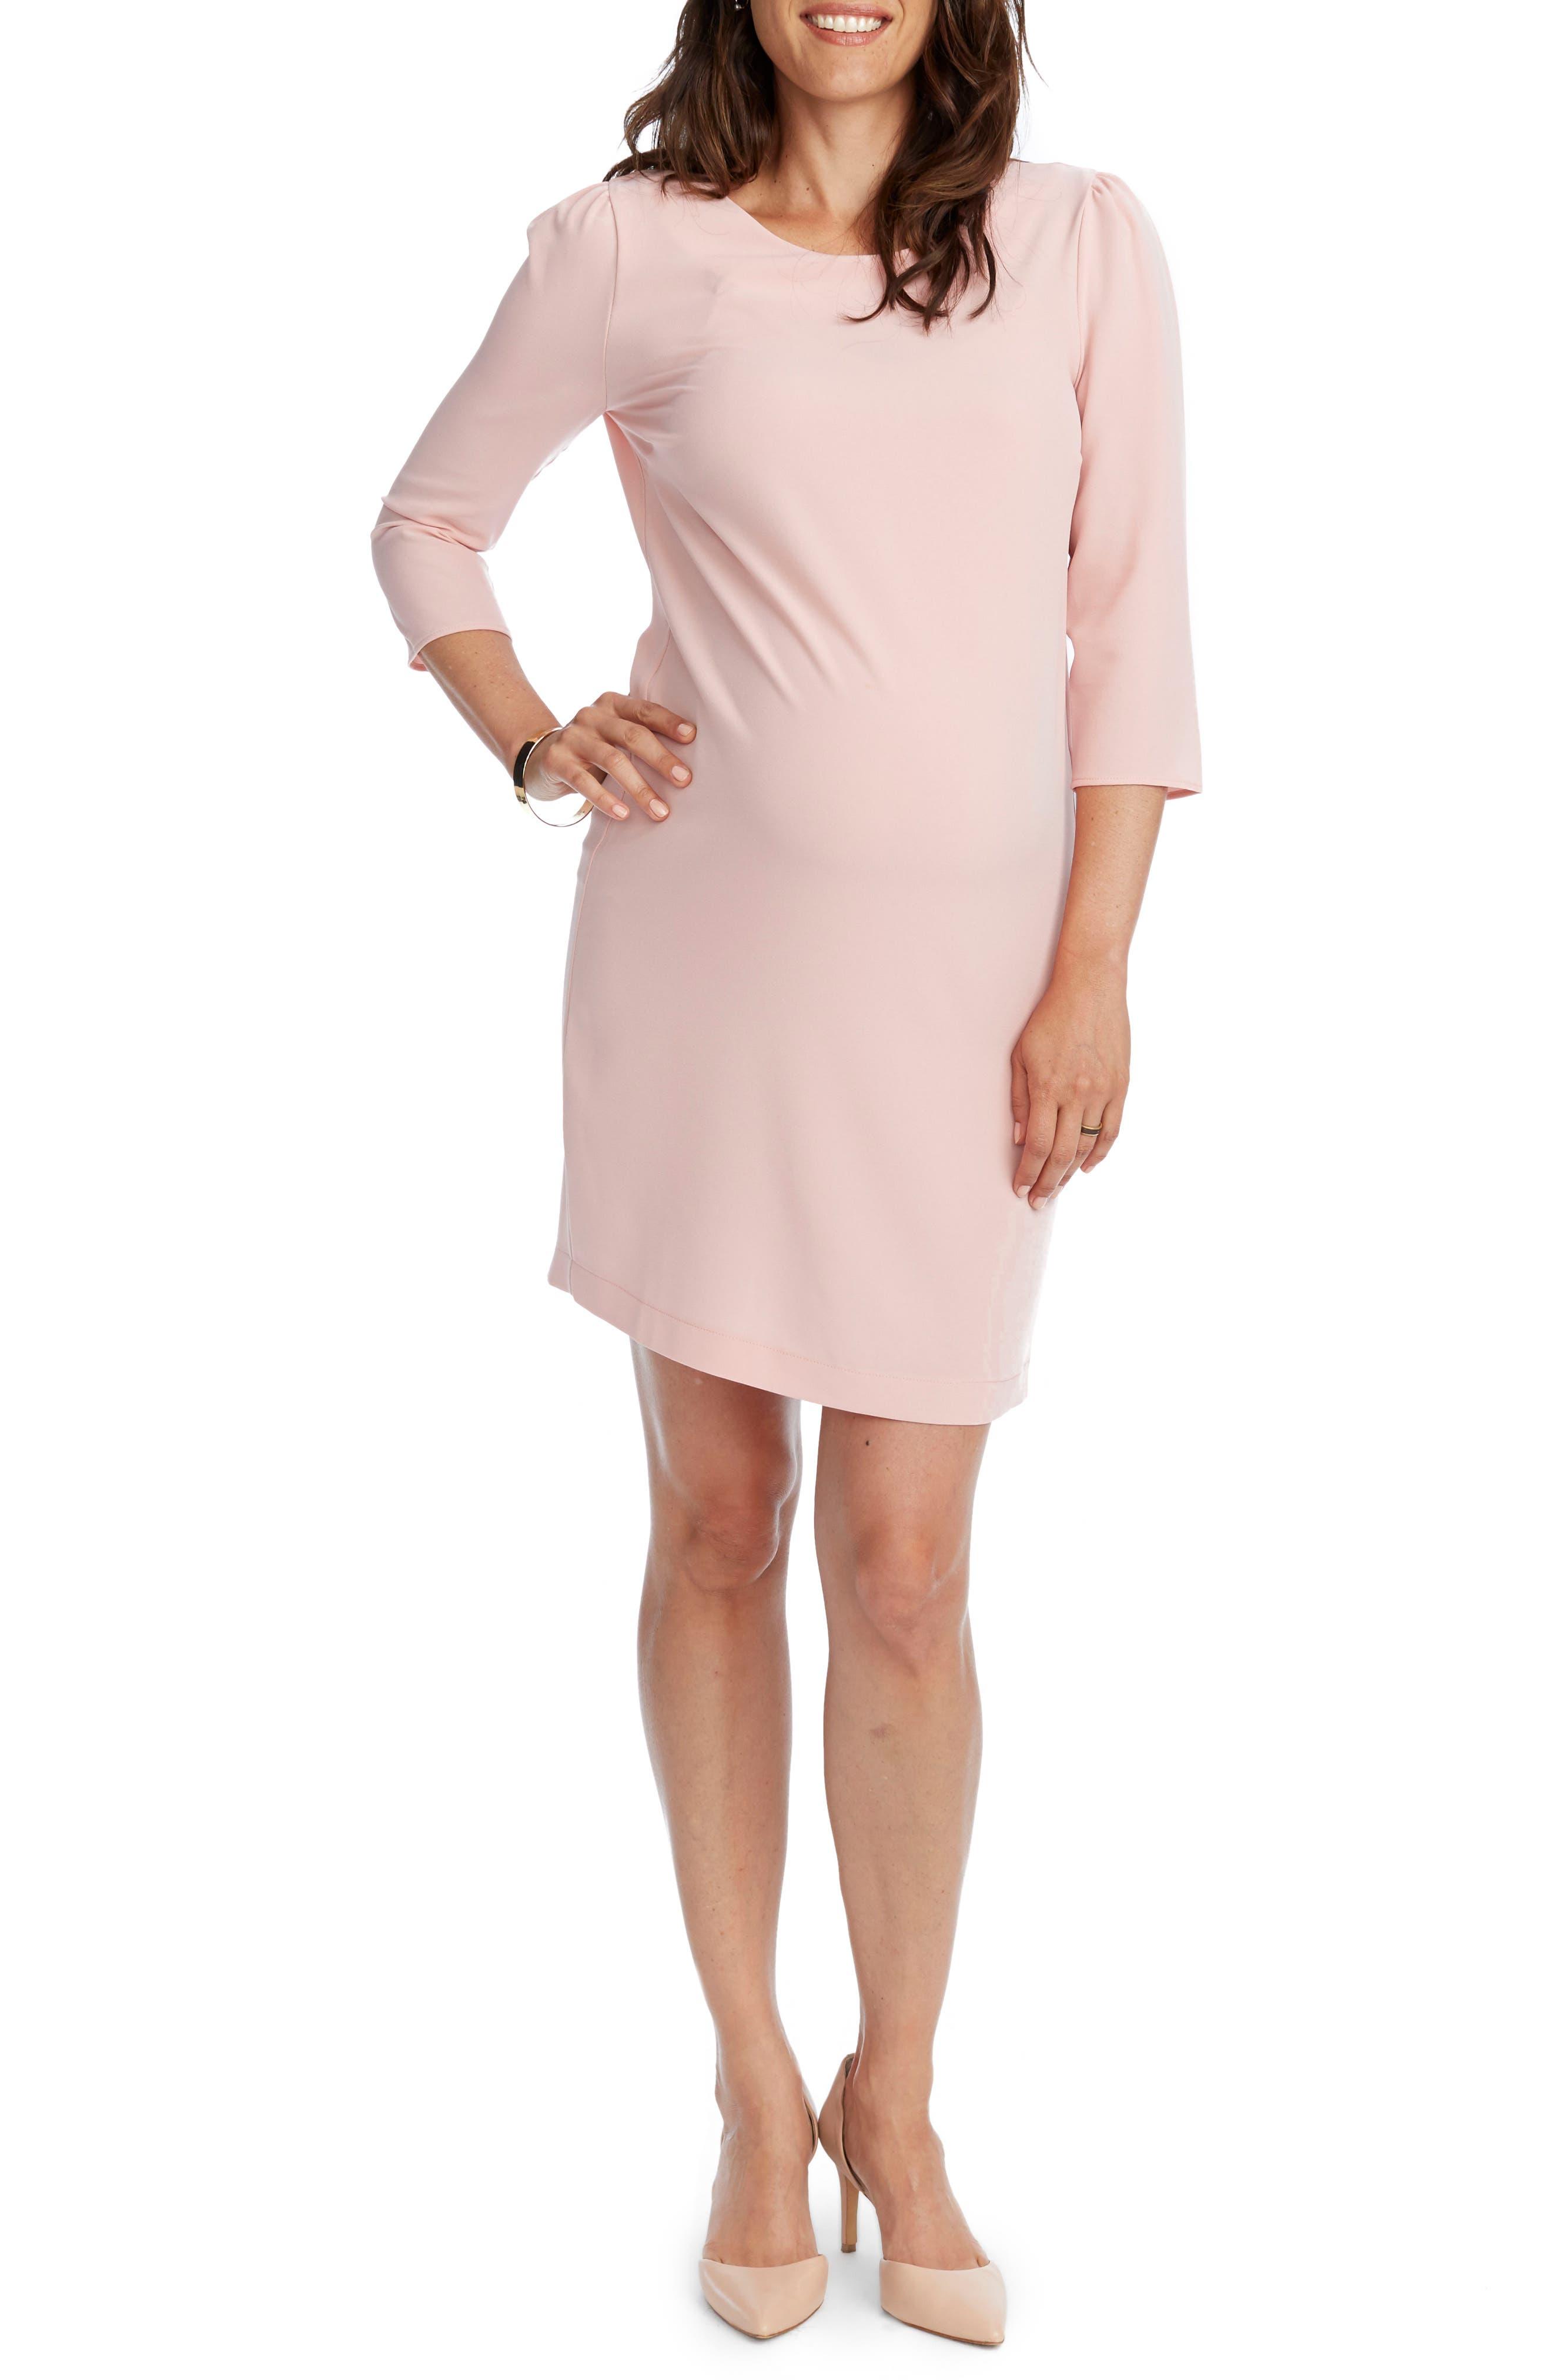 Cammie Maternity Shift Dress,                             Main thumbnail 1, color,                             Blush